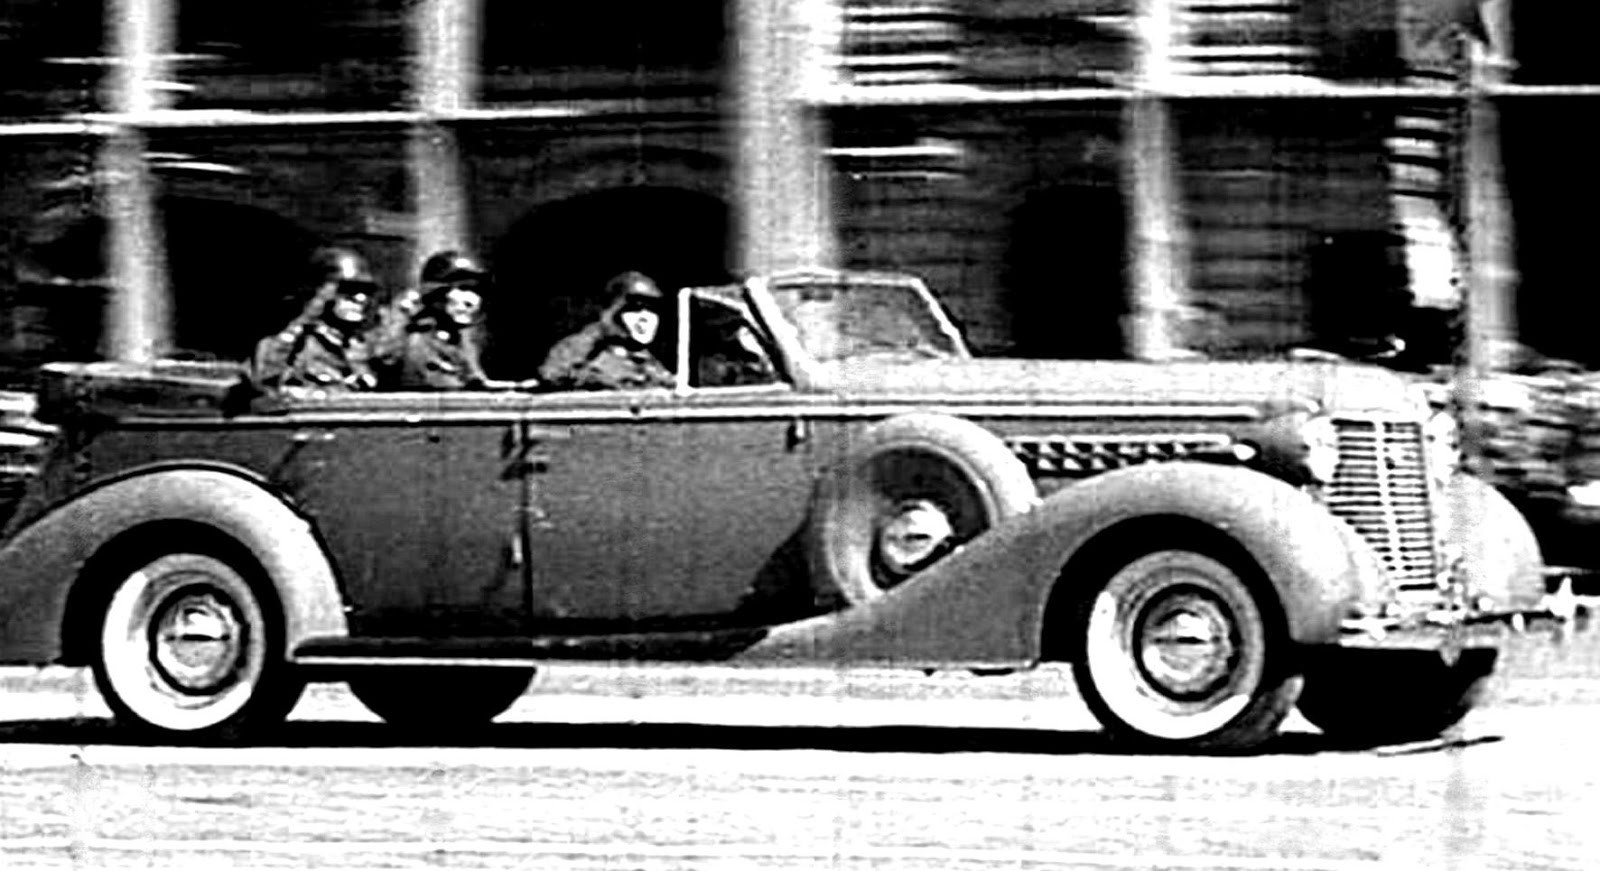 армейские легковушки СССР 27